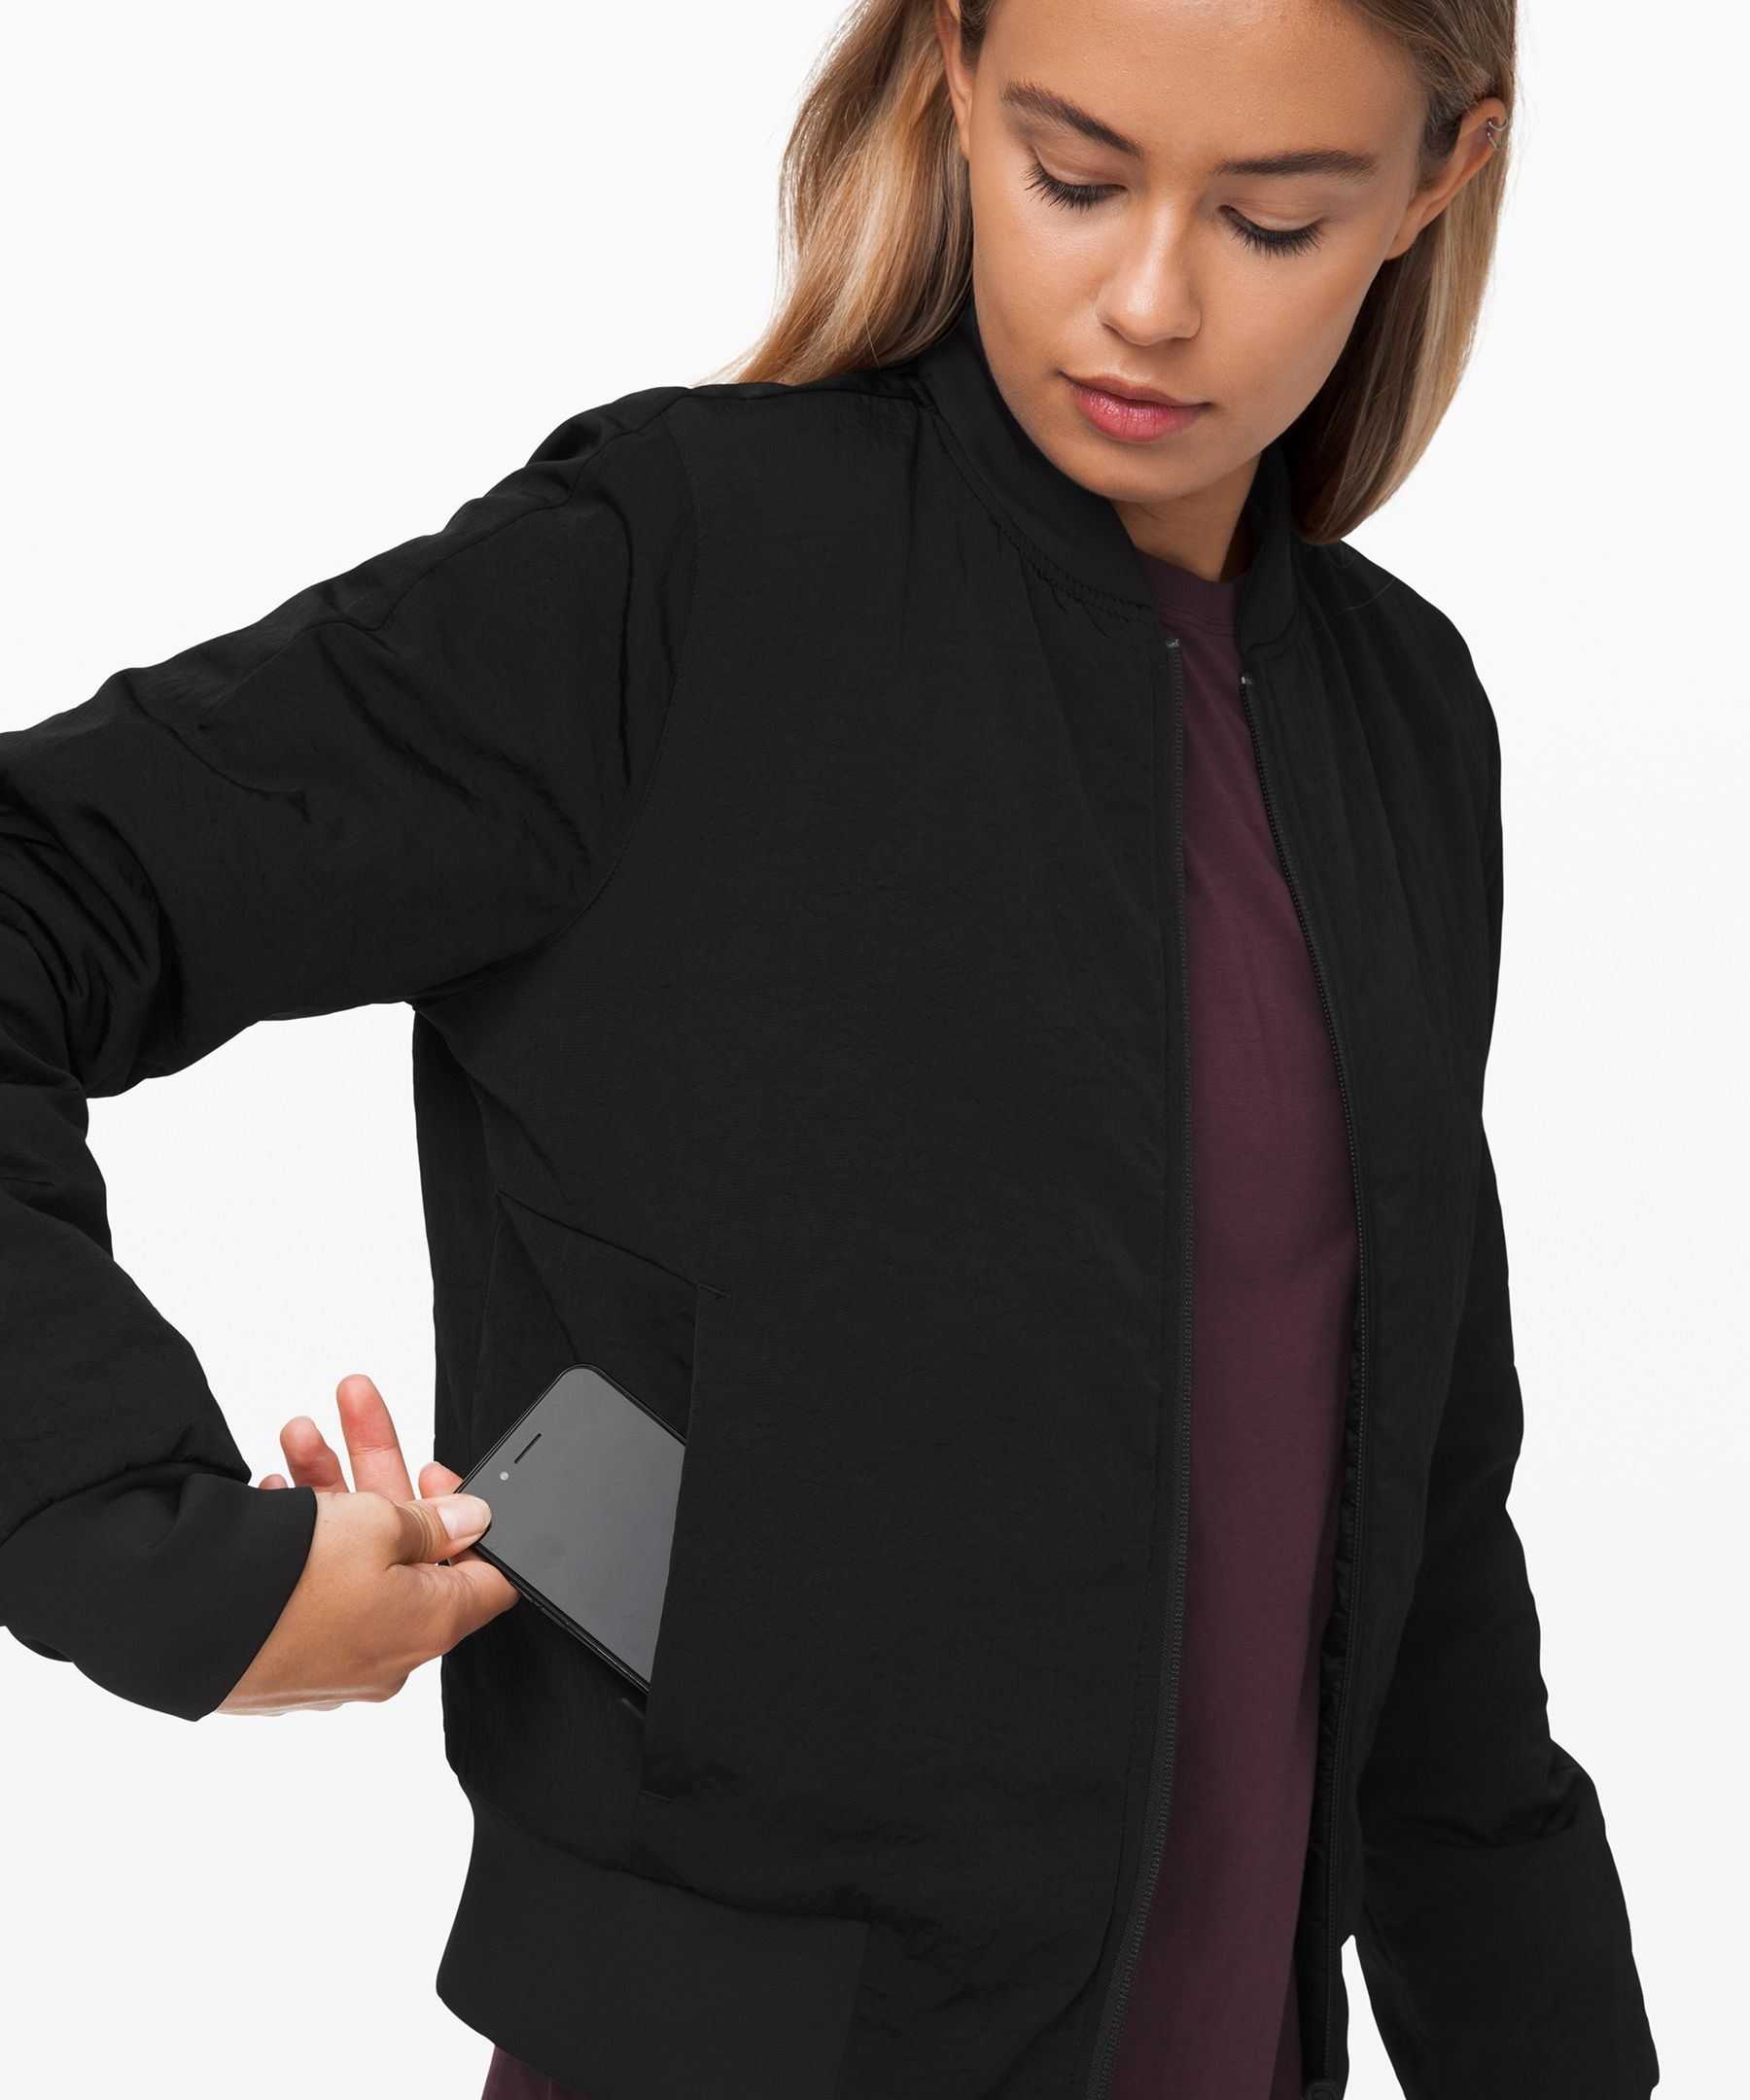 Non Stop Bomber Reversible Women S Jackets Lululemon Jackets For Women Bomber Jacket Women Lululemon Women [ 2160 x 1800 Pixel ]